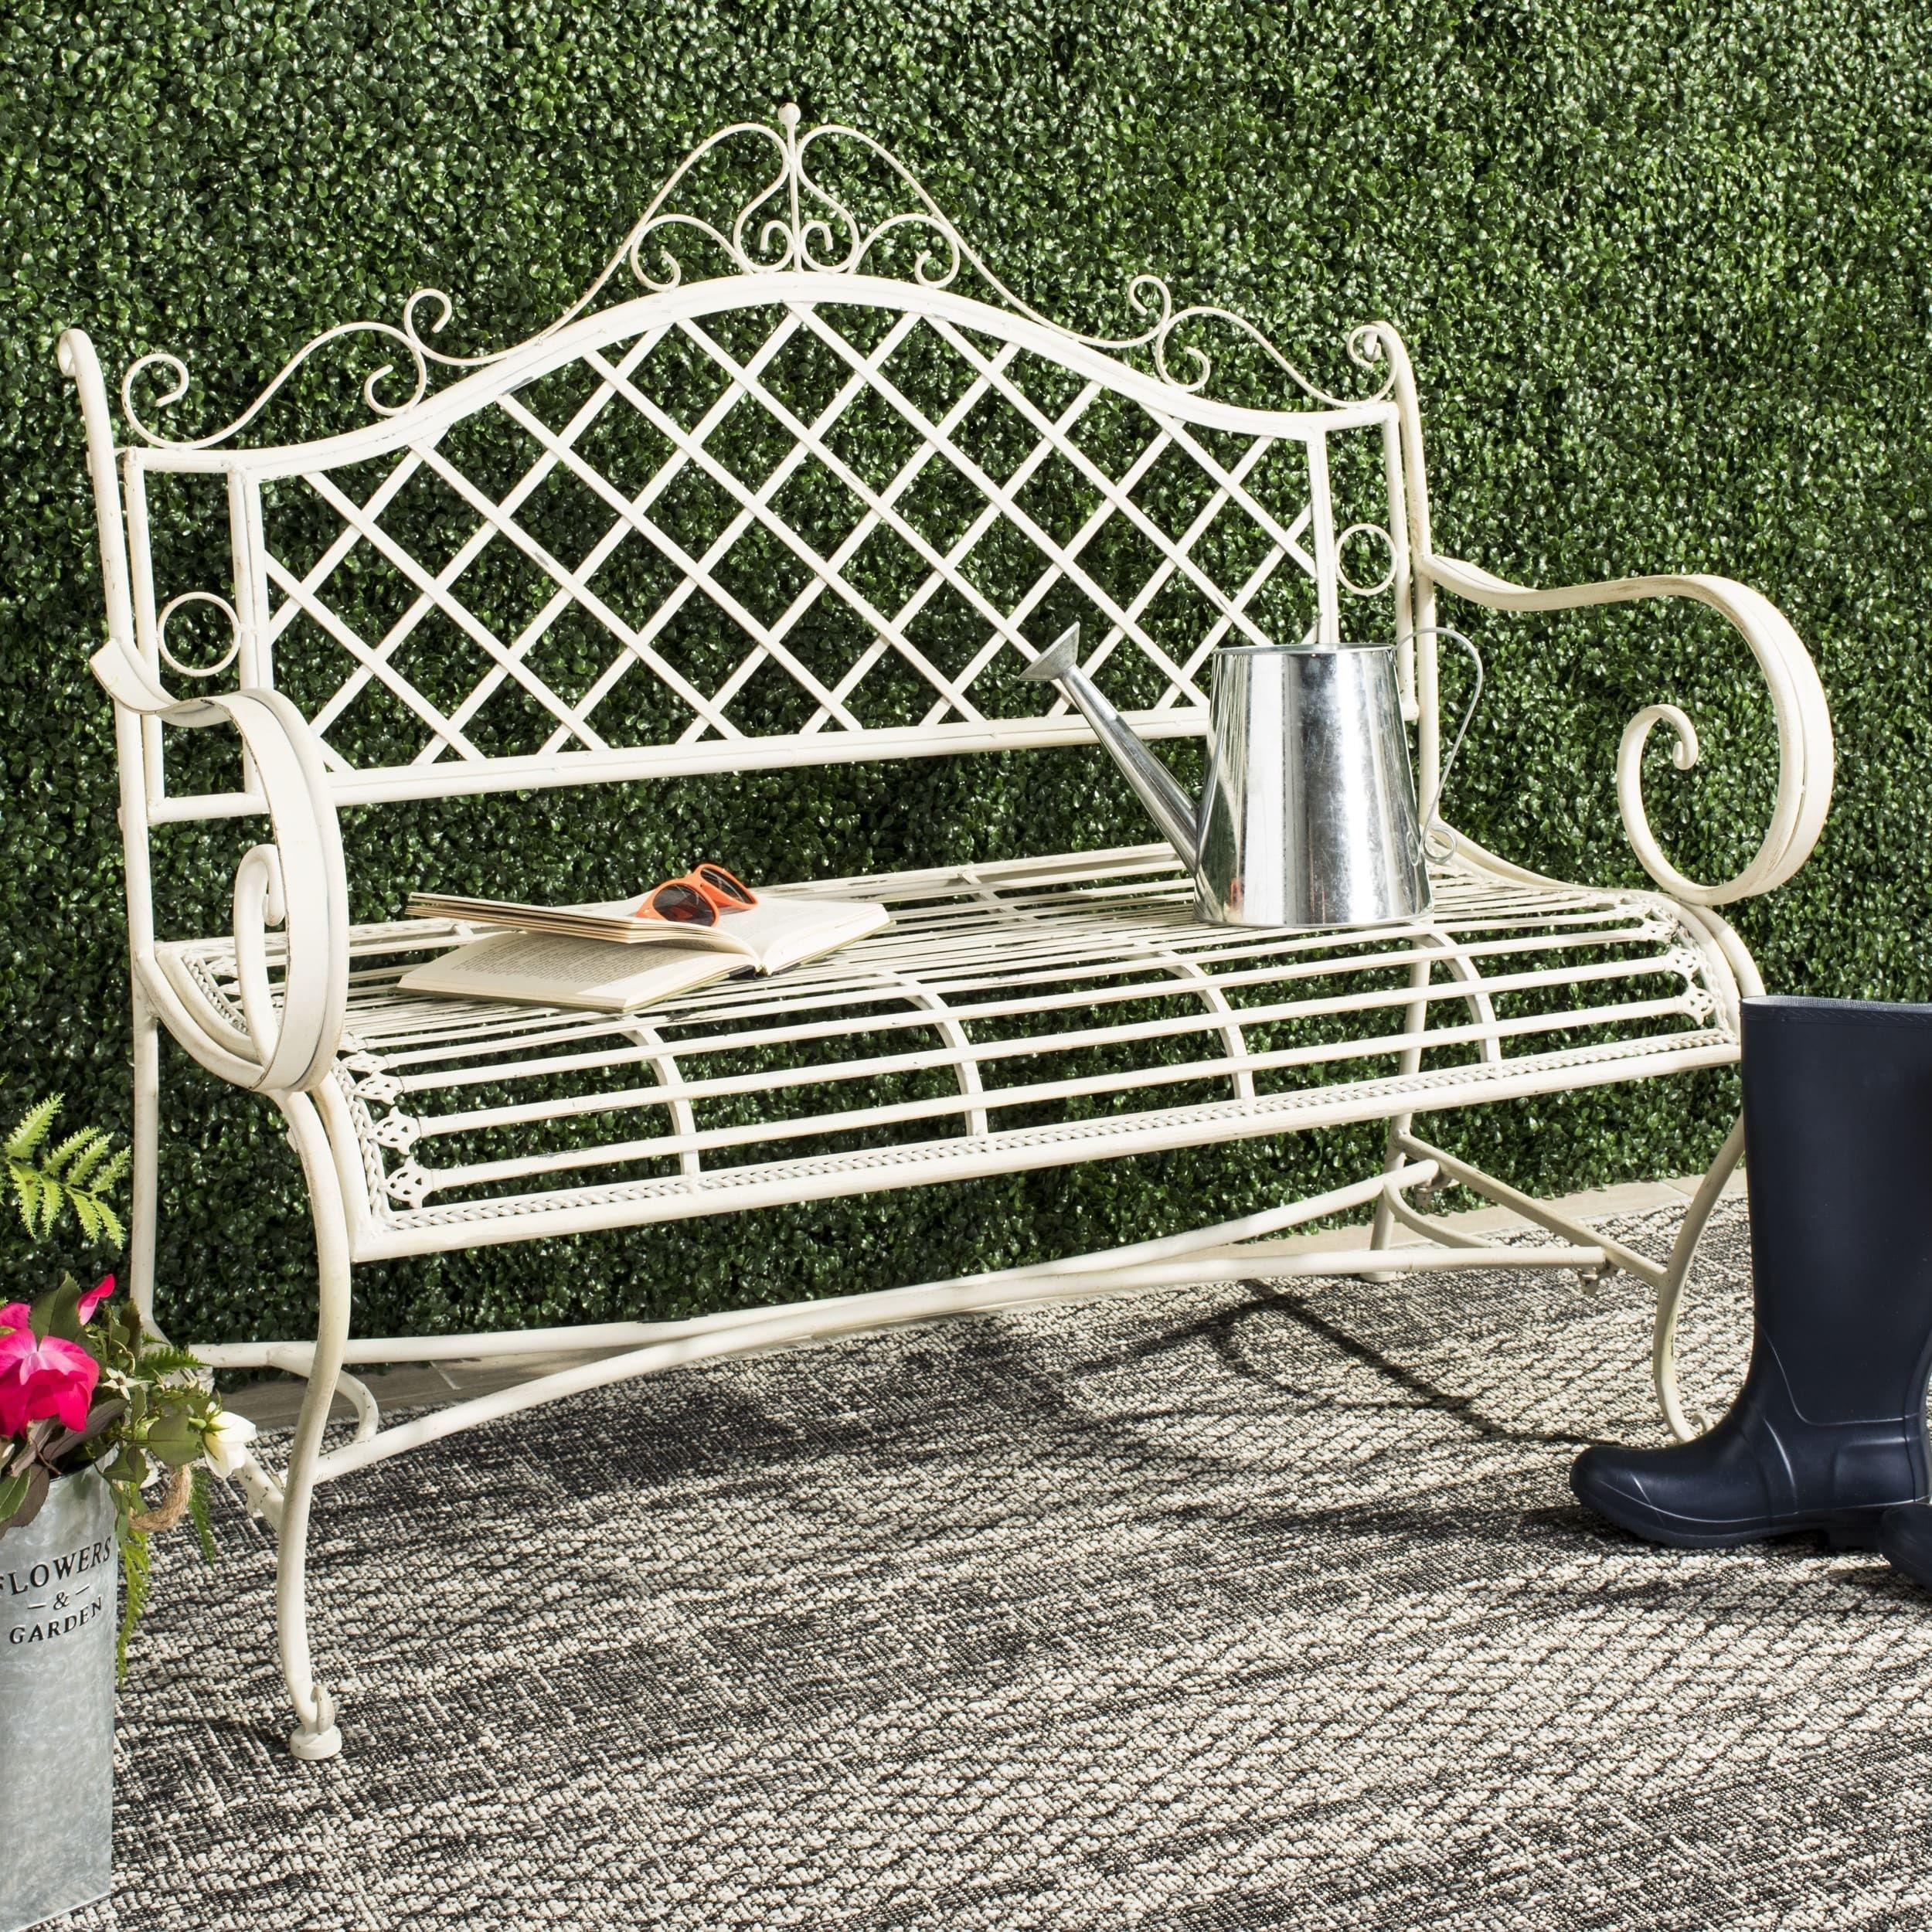 Safavieh Outdoor Living Abner White Wrought Iron Garden Bench